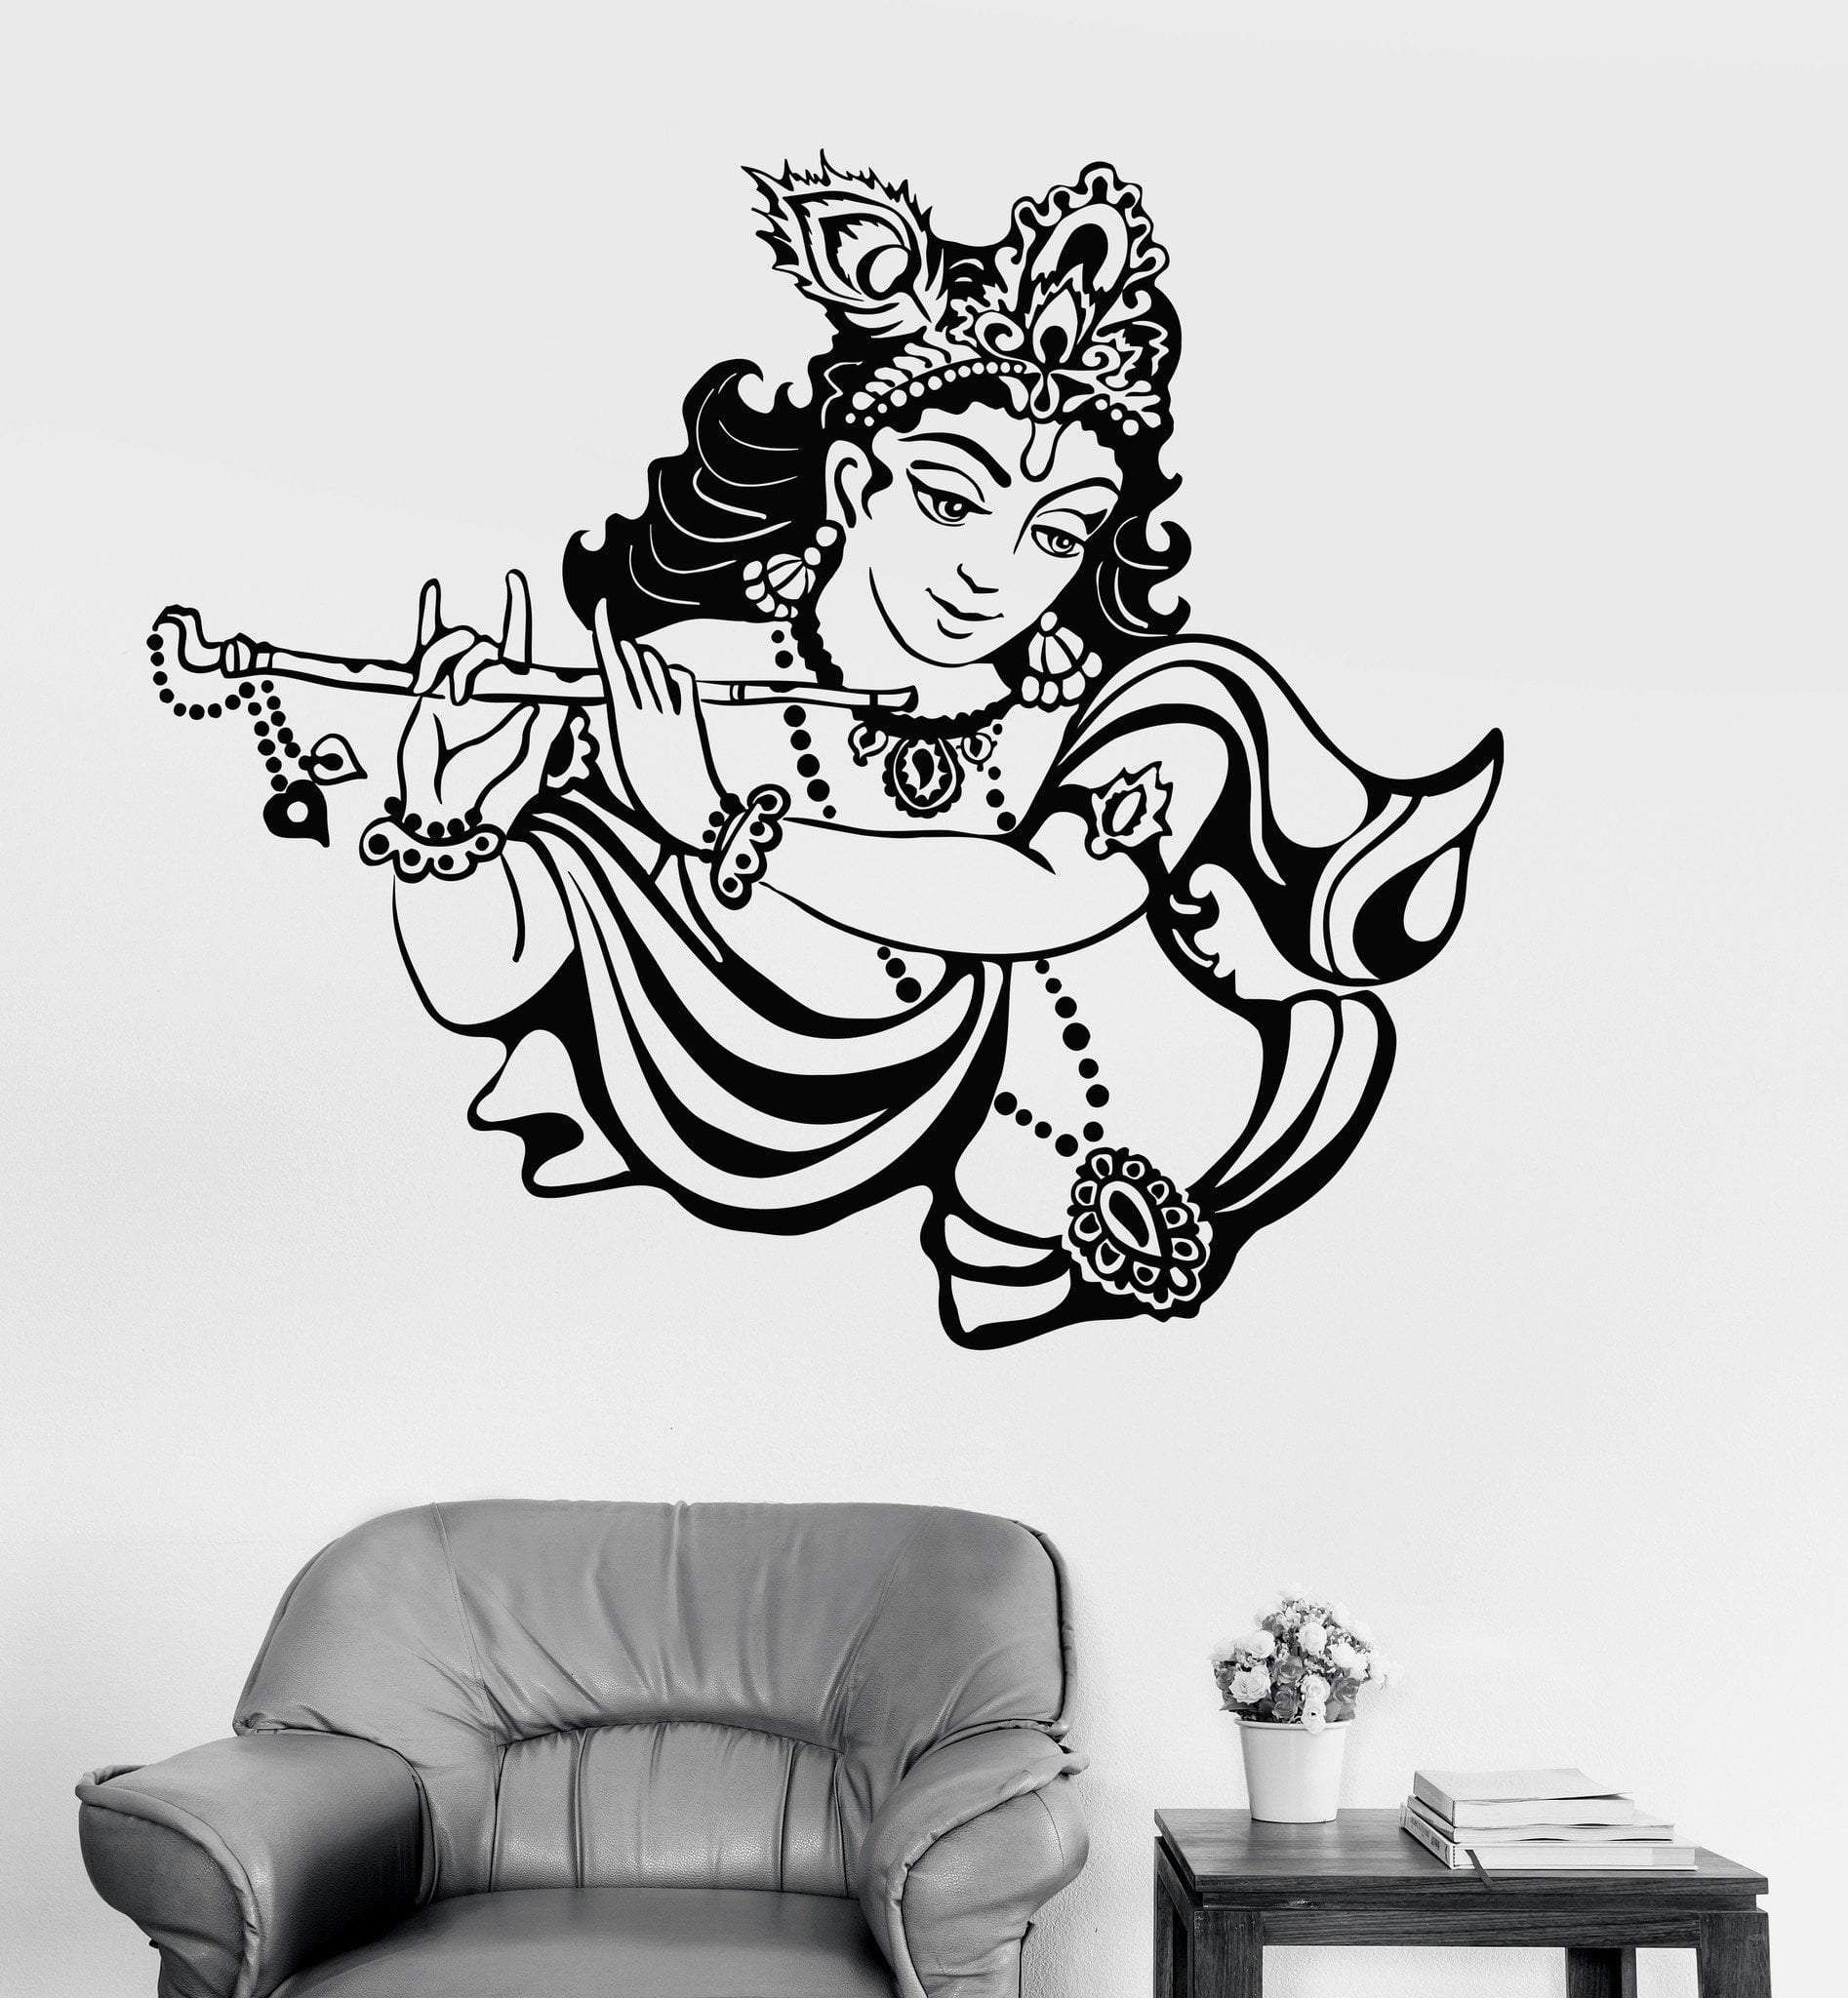 Vinyl Wall Decal Krishna Hinduism God India Hindu Stickers